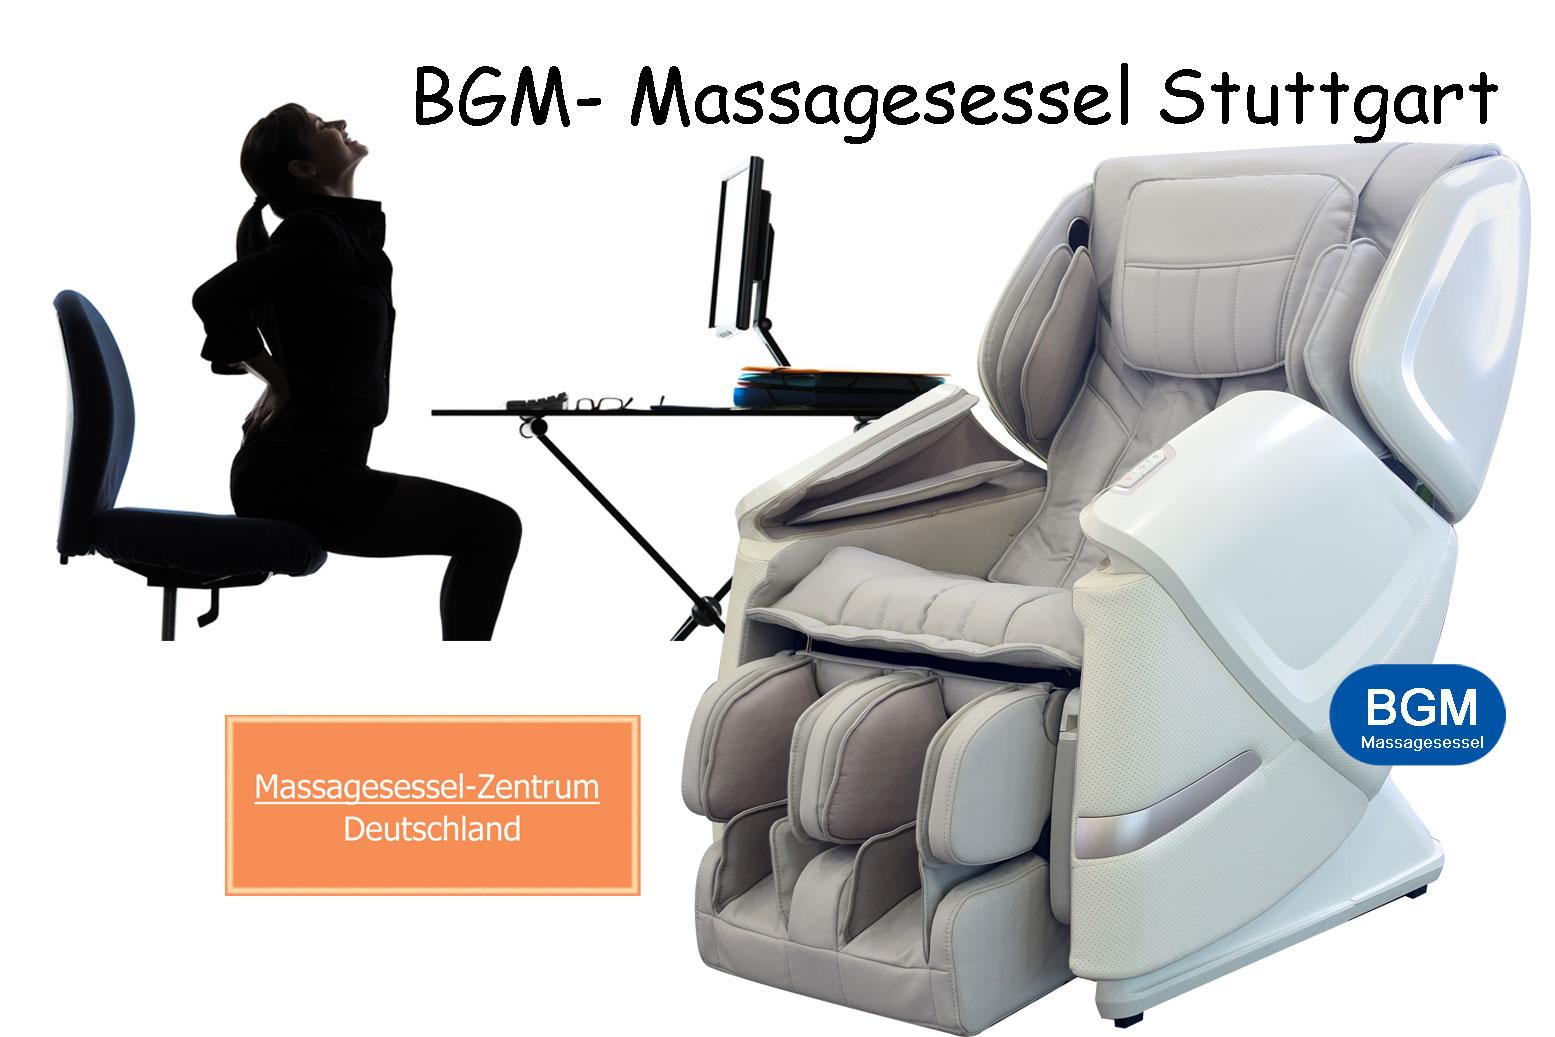 BGM-Massagesessel Stuttgart